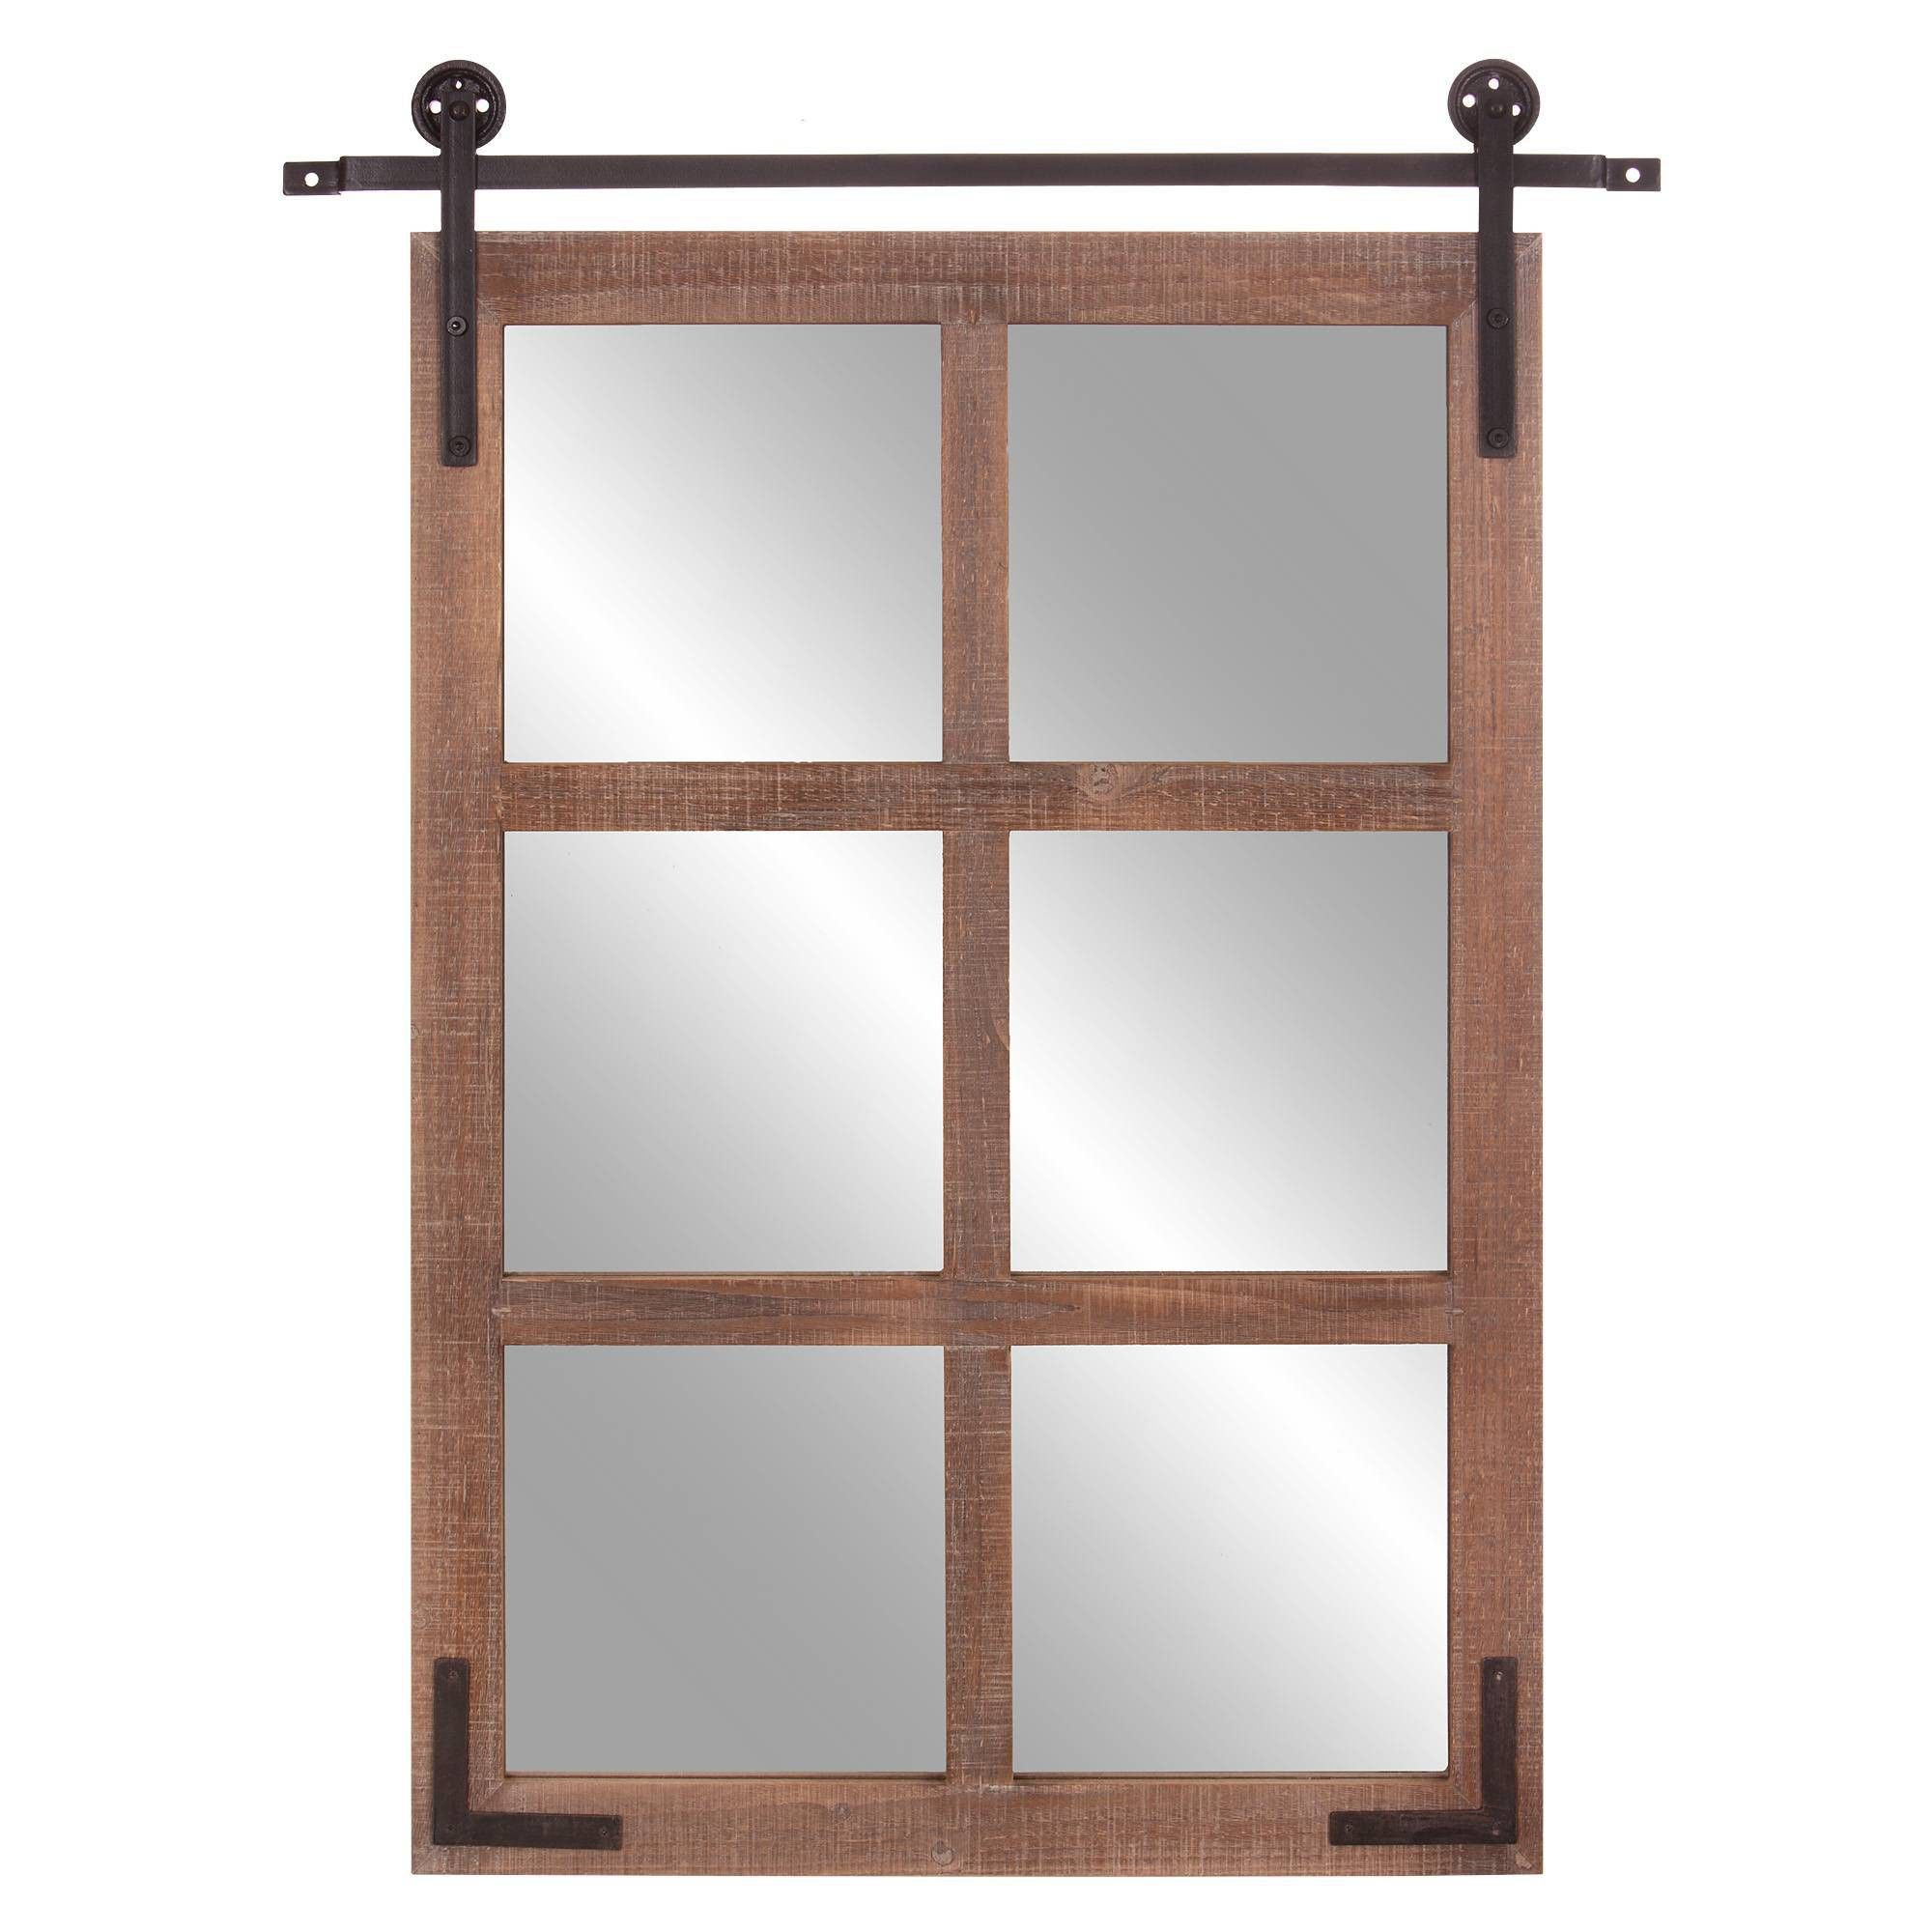 30 X 36 Sliding Barn Door Window Wall Mirror Wood Black Patton Wall Decor In 2020 Farmhouse Mirrors Window Wall Wood Windows